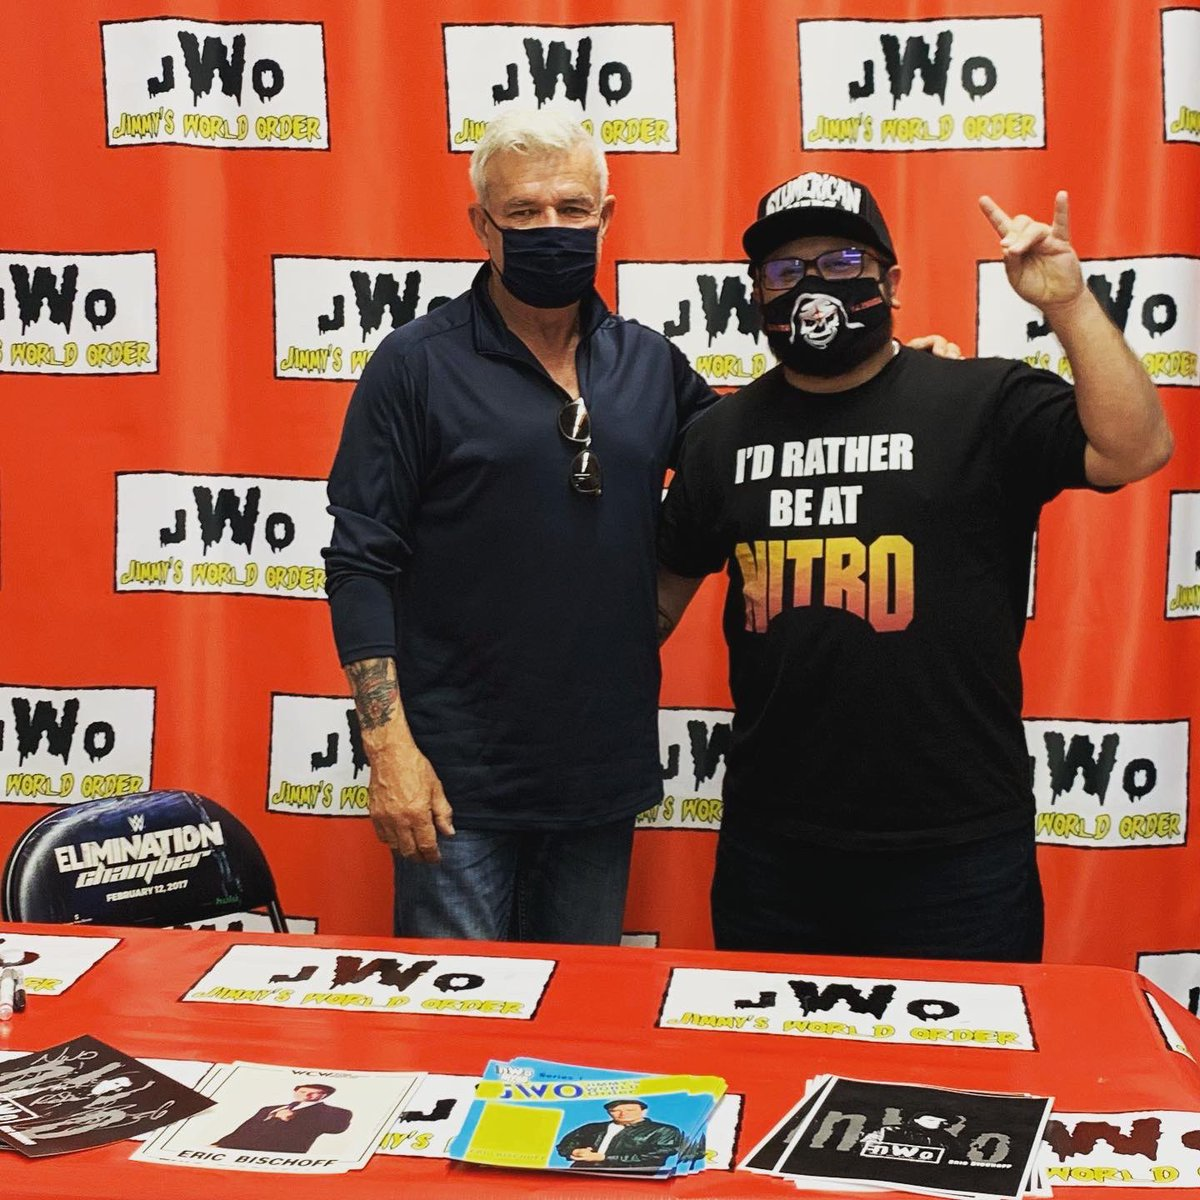 Met @EBischoff at @TherealjWo1 today!!! @83Weeks  #wcwnitro #mondaynightwars #ericbischoff #83weeks